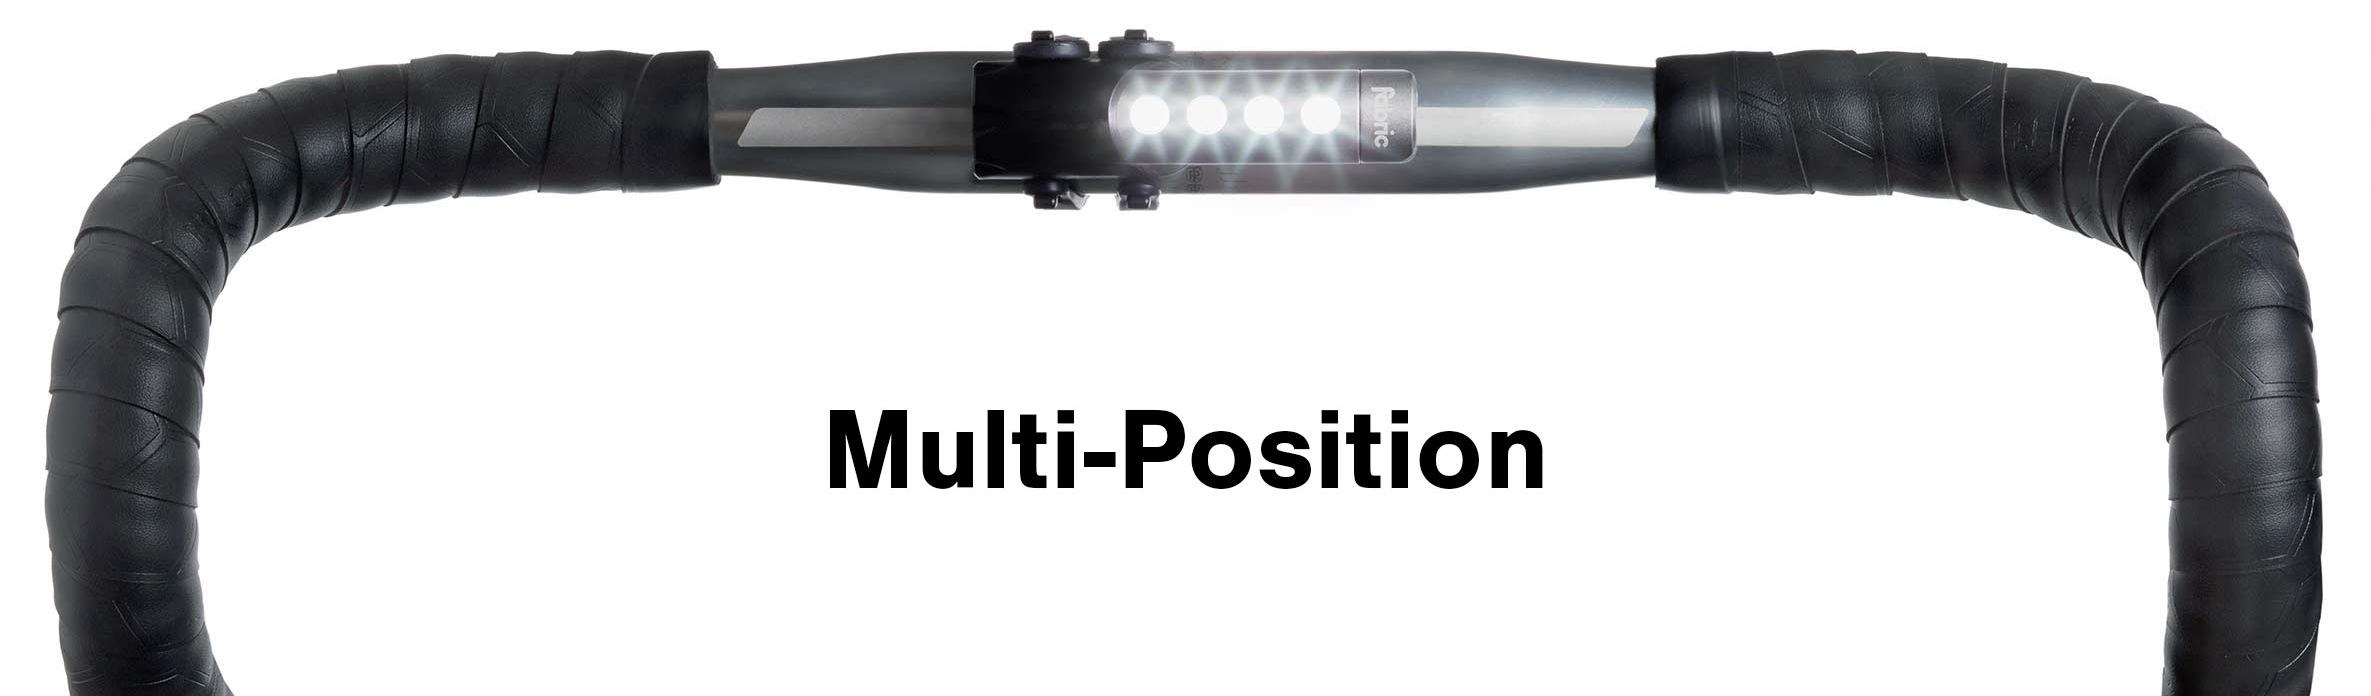 F L150 multipostion 1 2